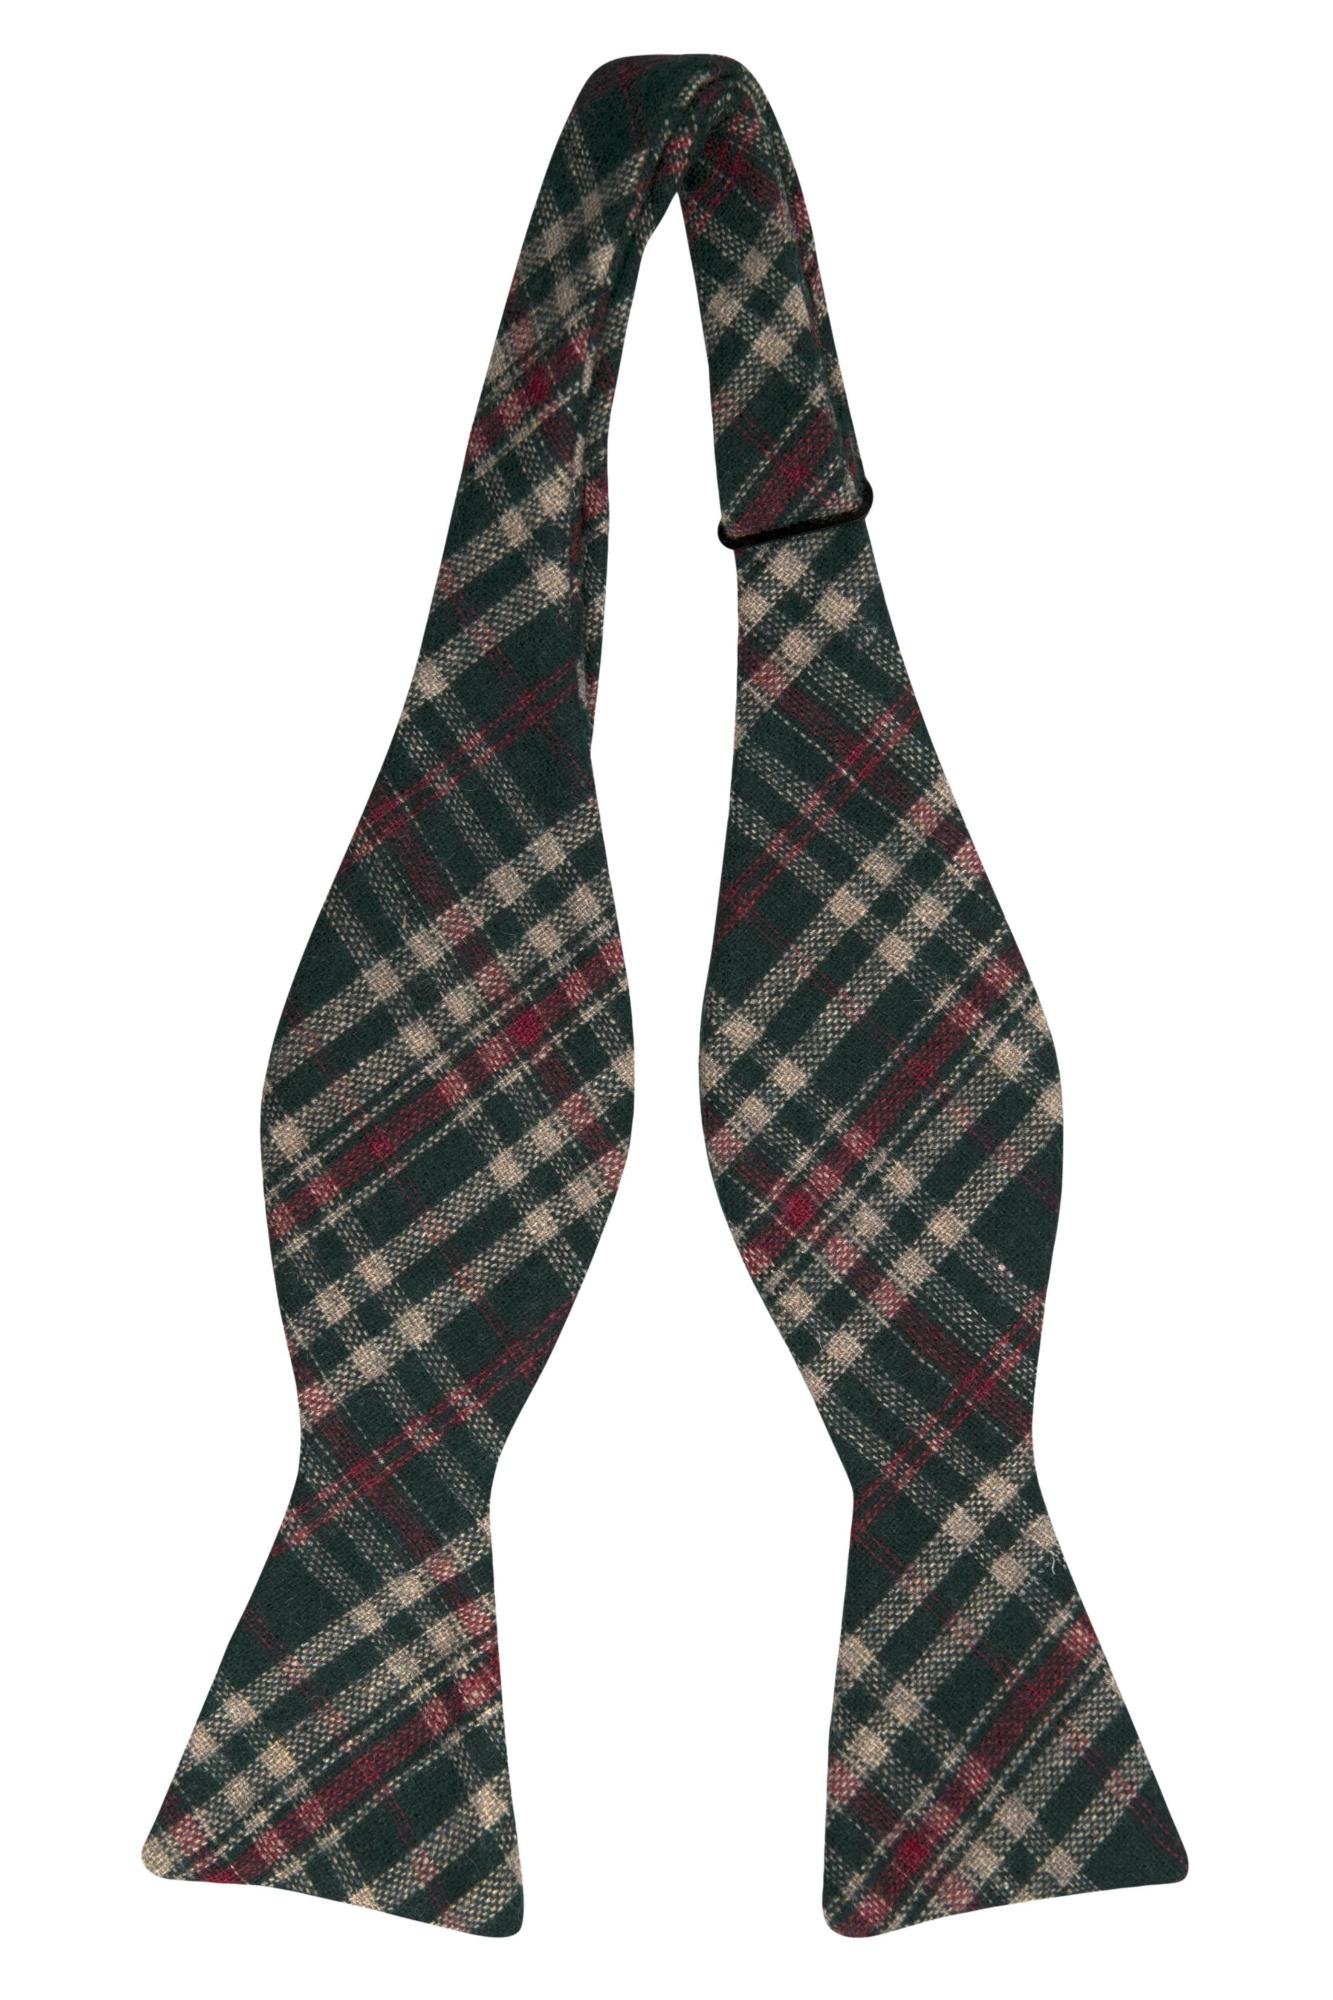 Nơ tự thắt Hotslig – Hostlig self-tie bow tie